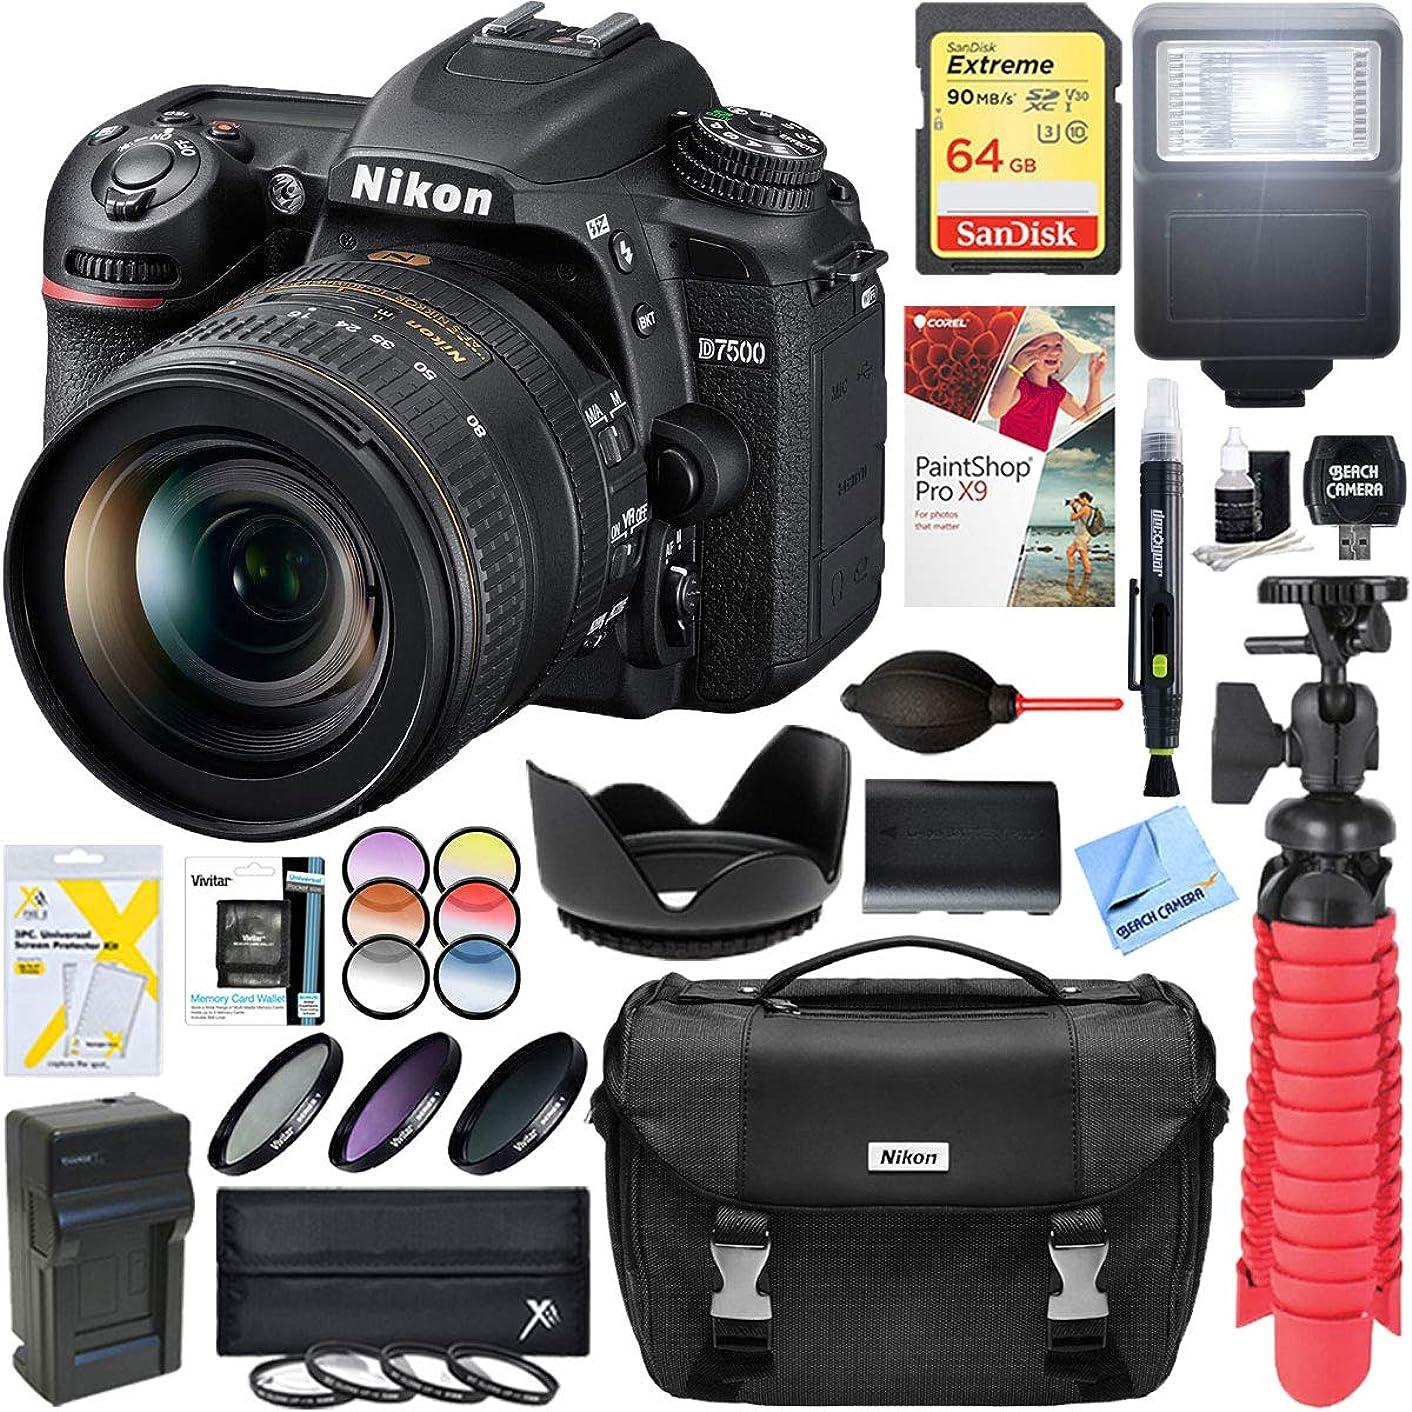 Nikon D7500 20.9MP DX-Format DSLR Camera with AF-S 16-80mm f/2.8-4E ED VR Lens + 64GB Deluxe Accessory Bundle